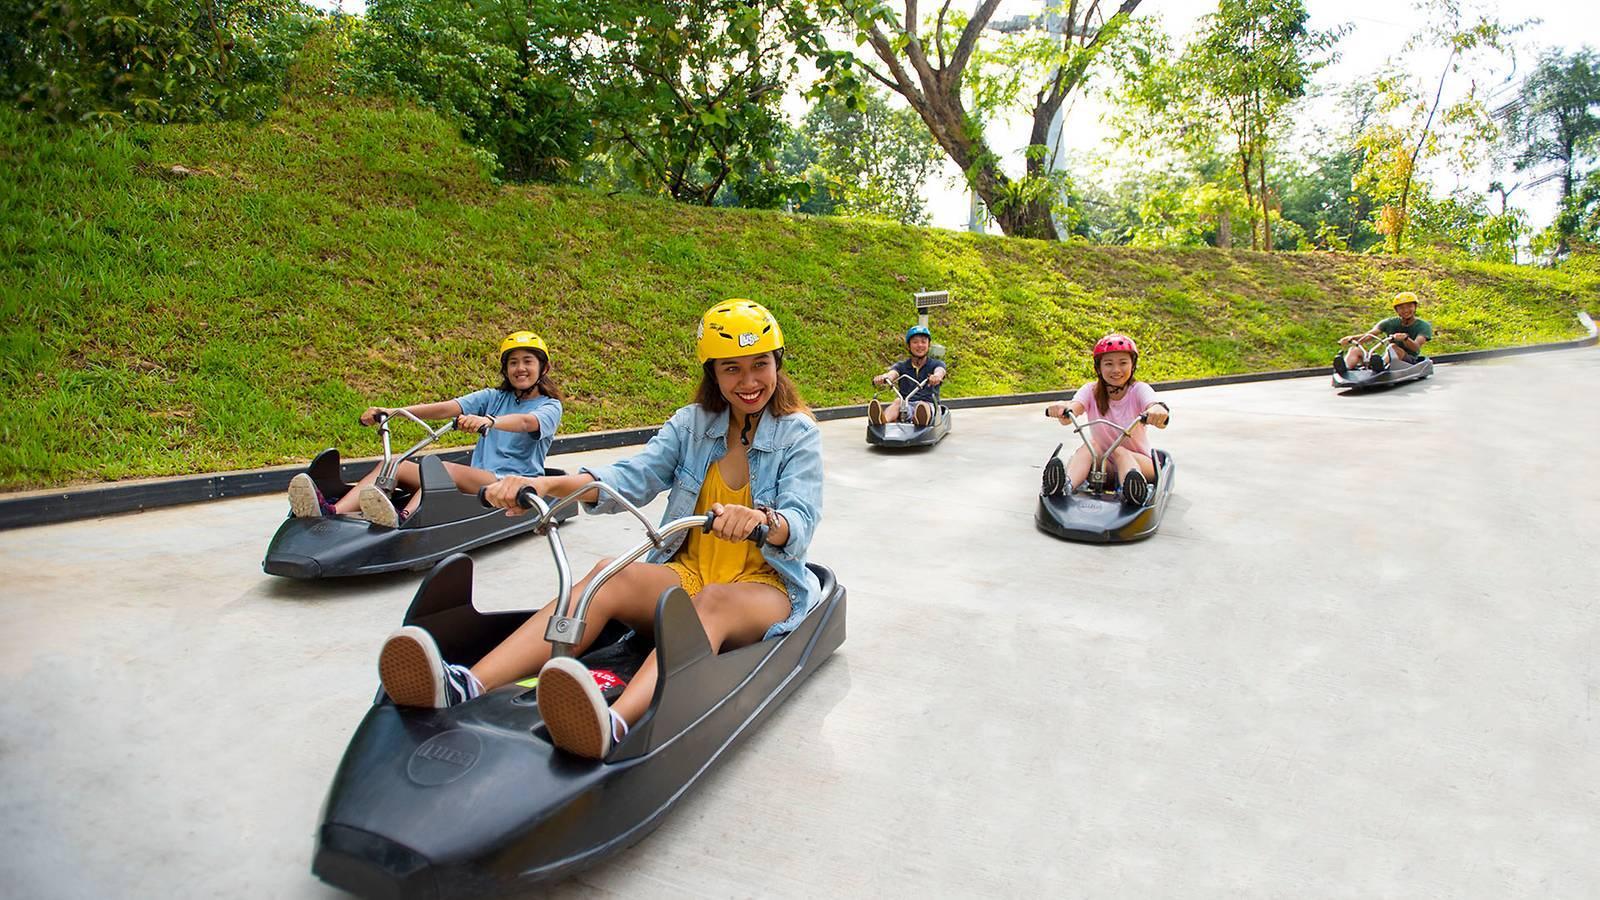 Free rides at Skyline Luge Sentosa